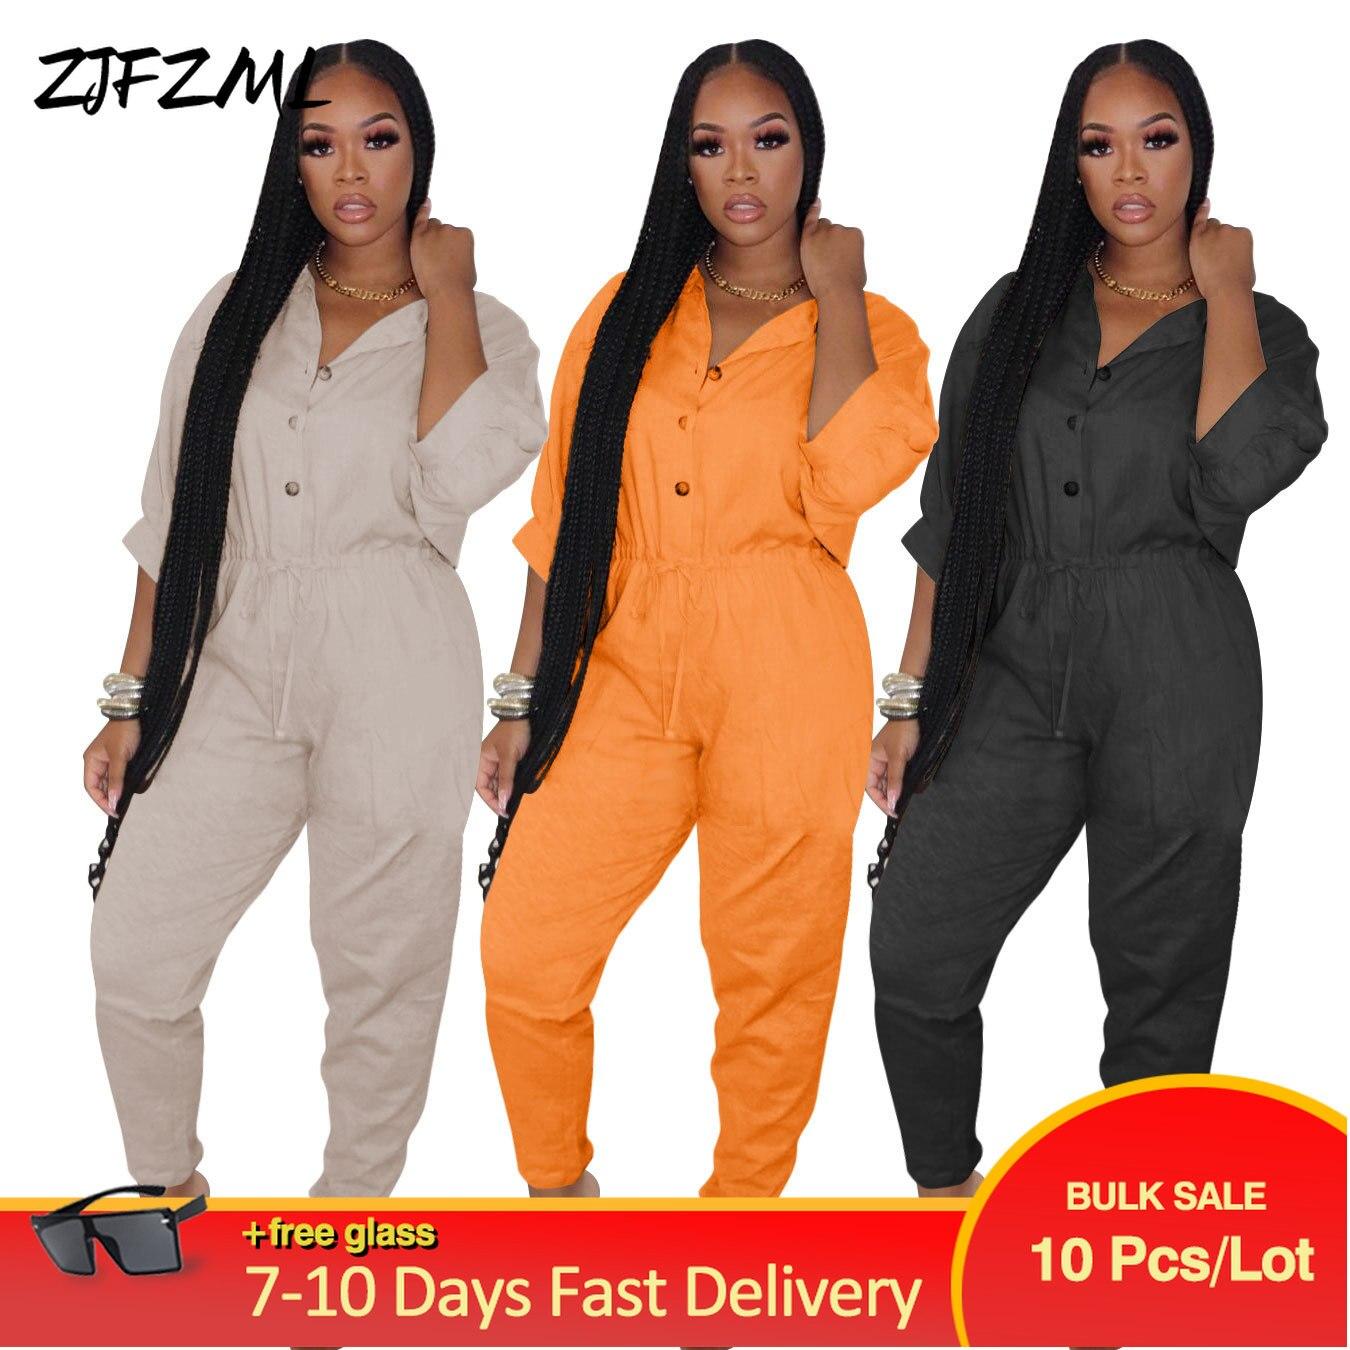 Bulk Items Wholesale Lots Casual Autumn Long Jumpsuits Women Solid Buttons Up Half Sleeve Romper Hip Hop High Waist Bodysuits